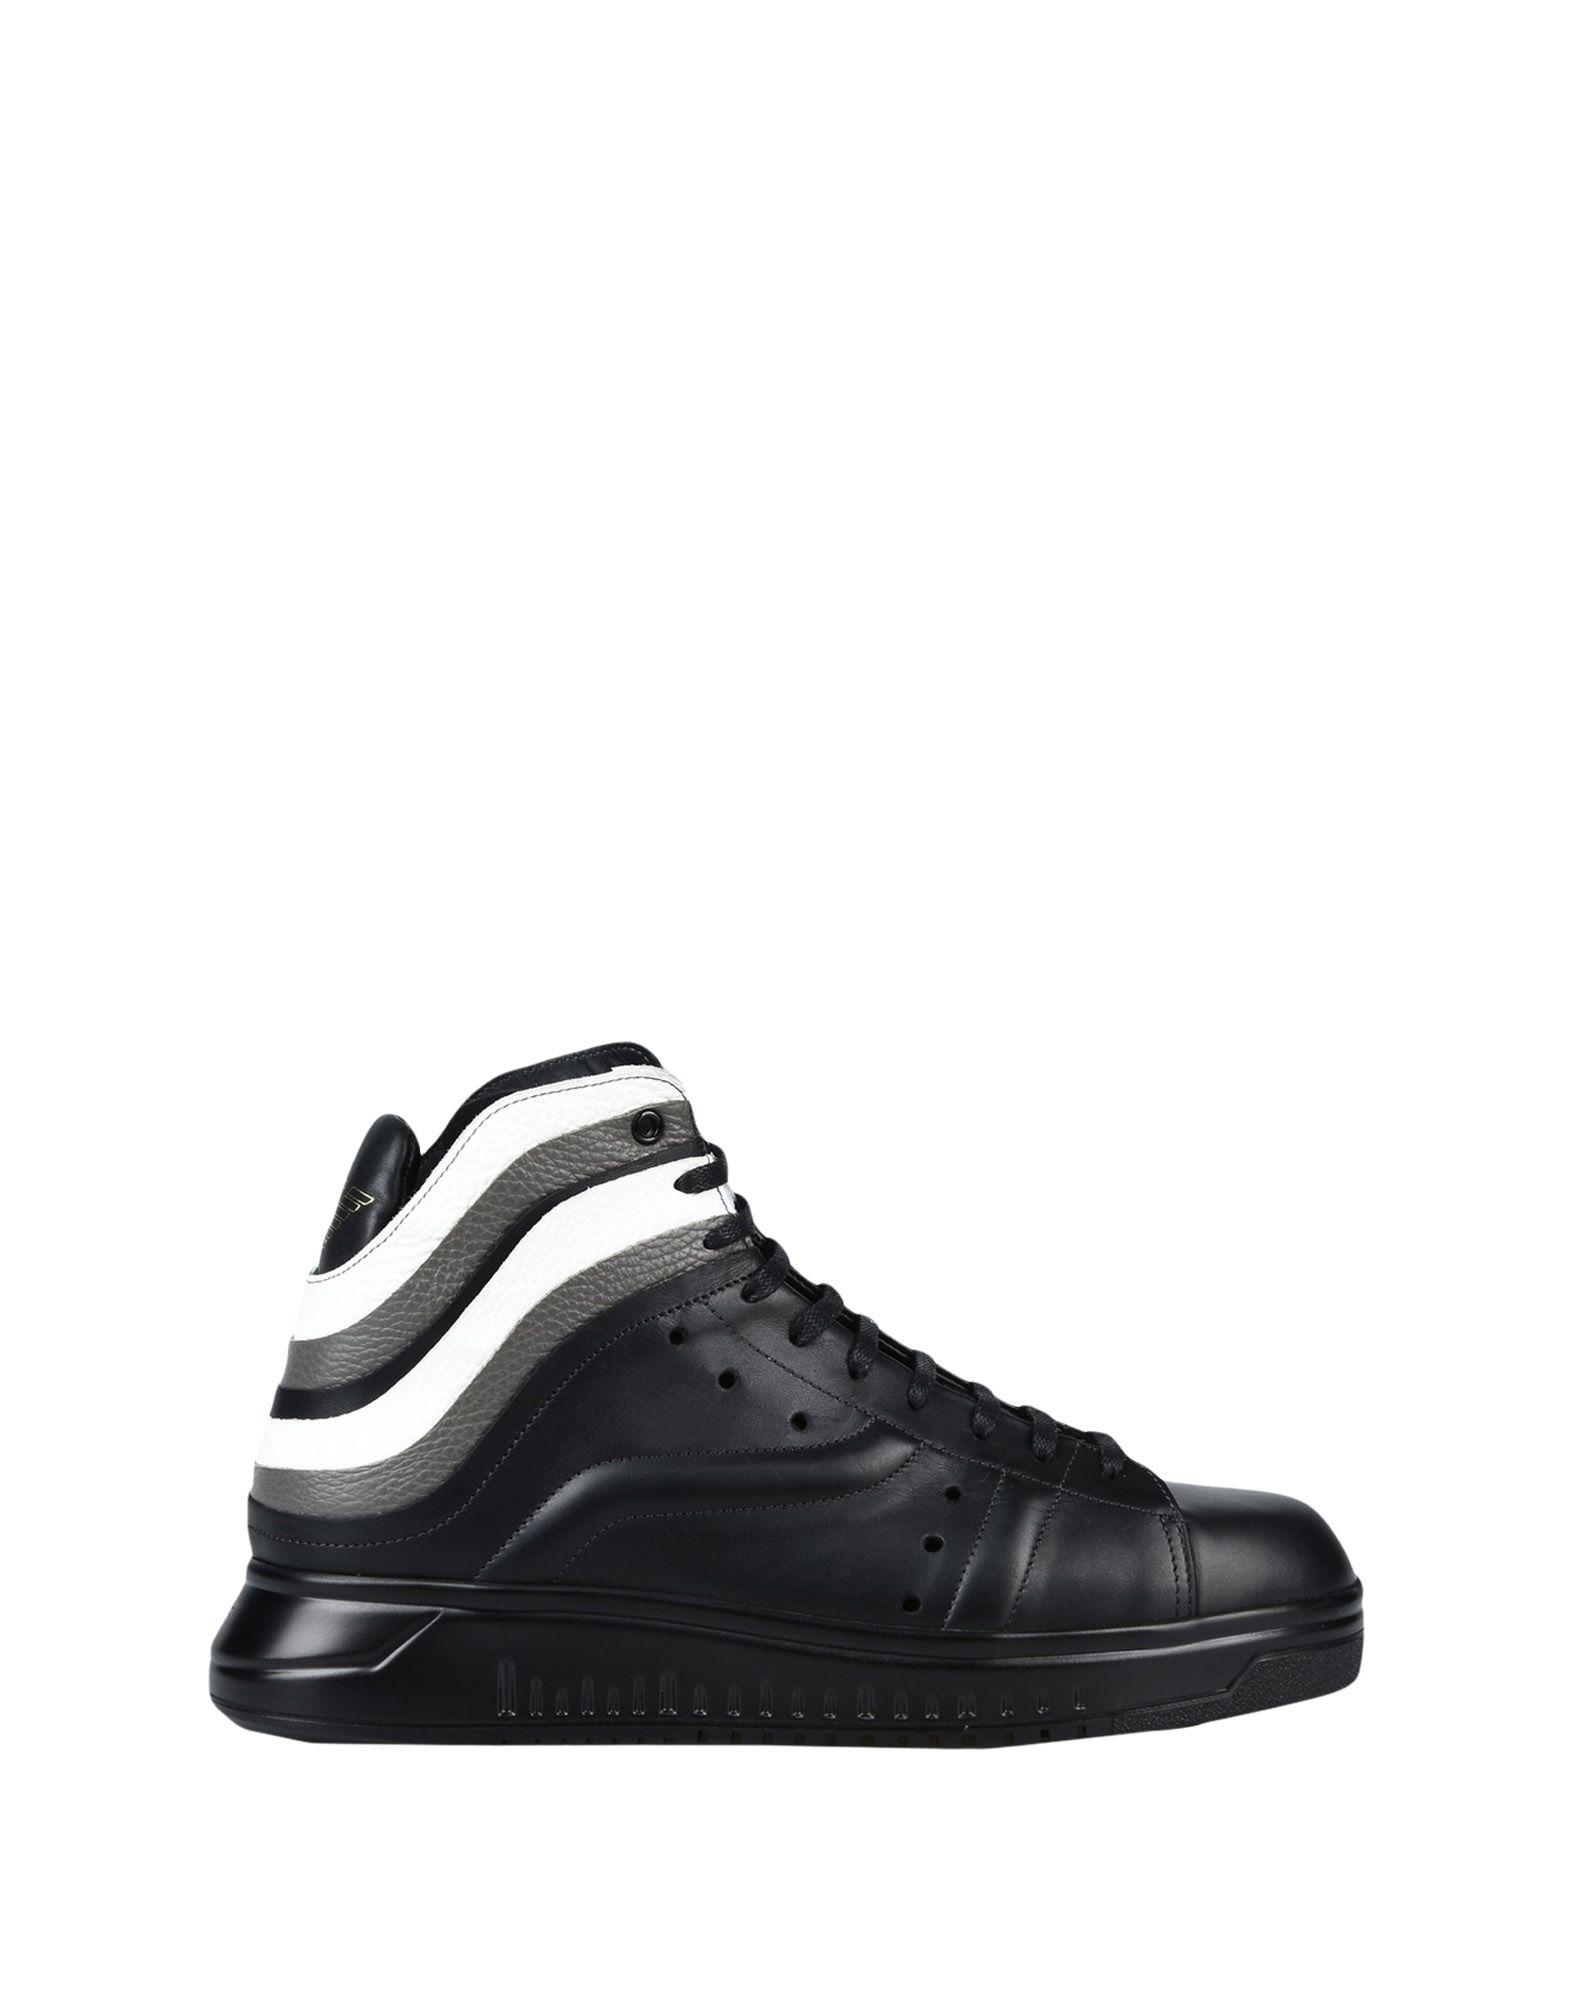 Emporio Armani Sneakers Sneakers Sneakers - Men Emporio Armani Sneakers online on  Canada - 11379797XB 3ba8f5